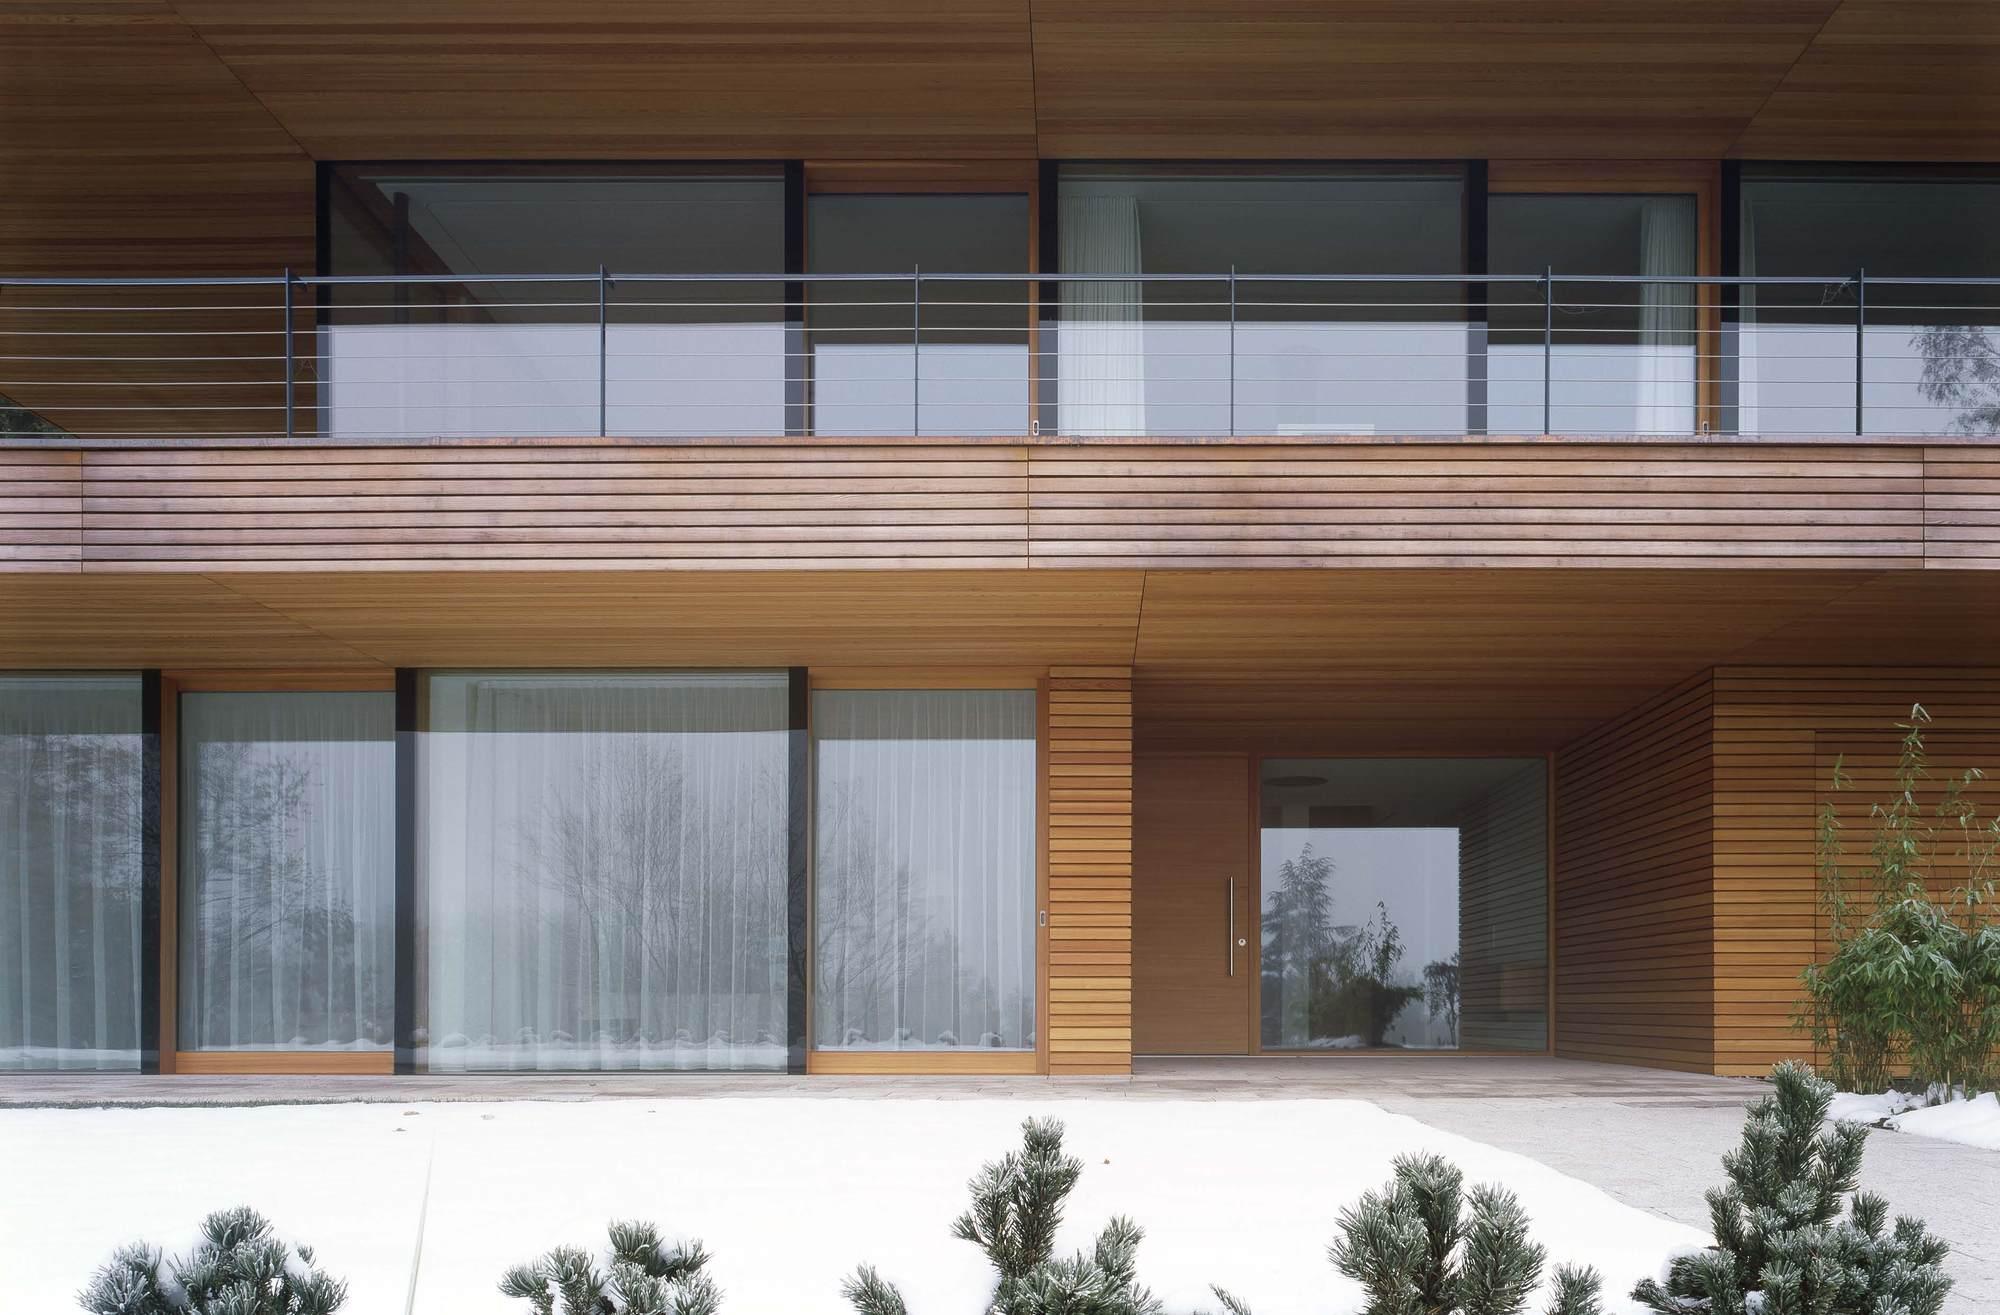 House Heilbronn by k_m architektur | KARMATRENDZ